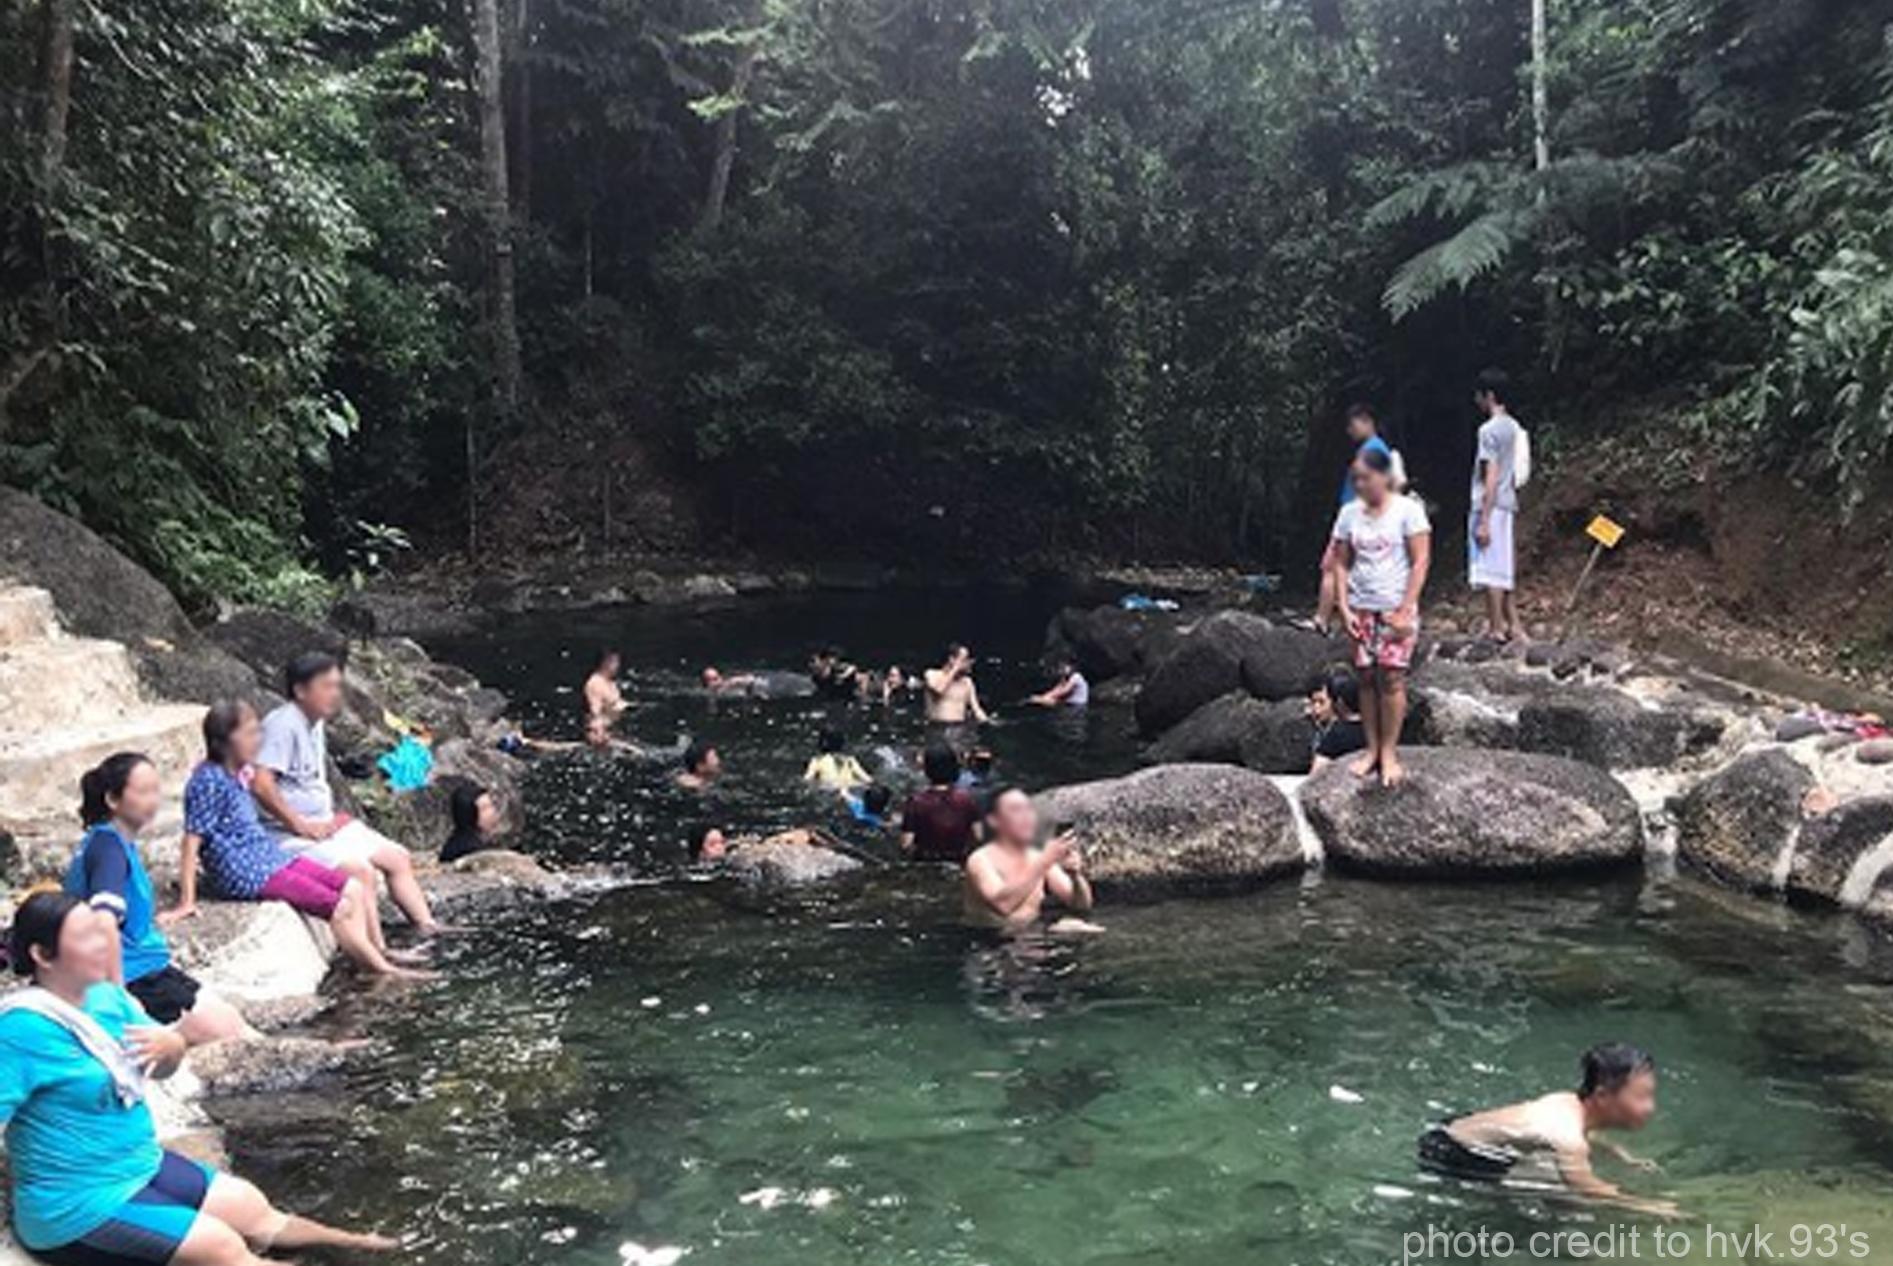 refreshing_springs_resort_selangor_camping_site_malaysia_car_camping-4